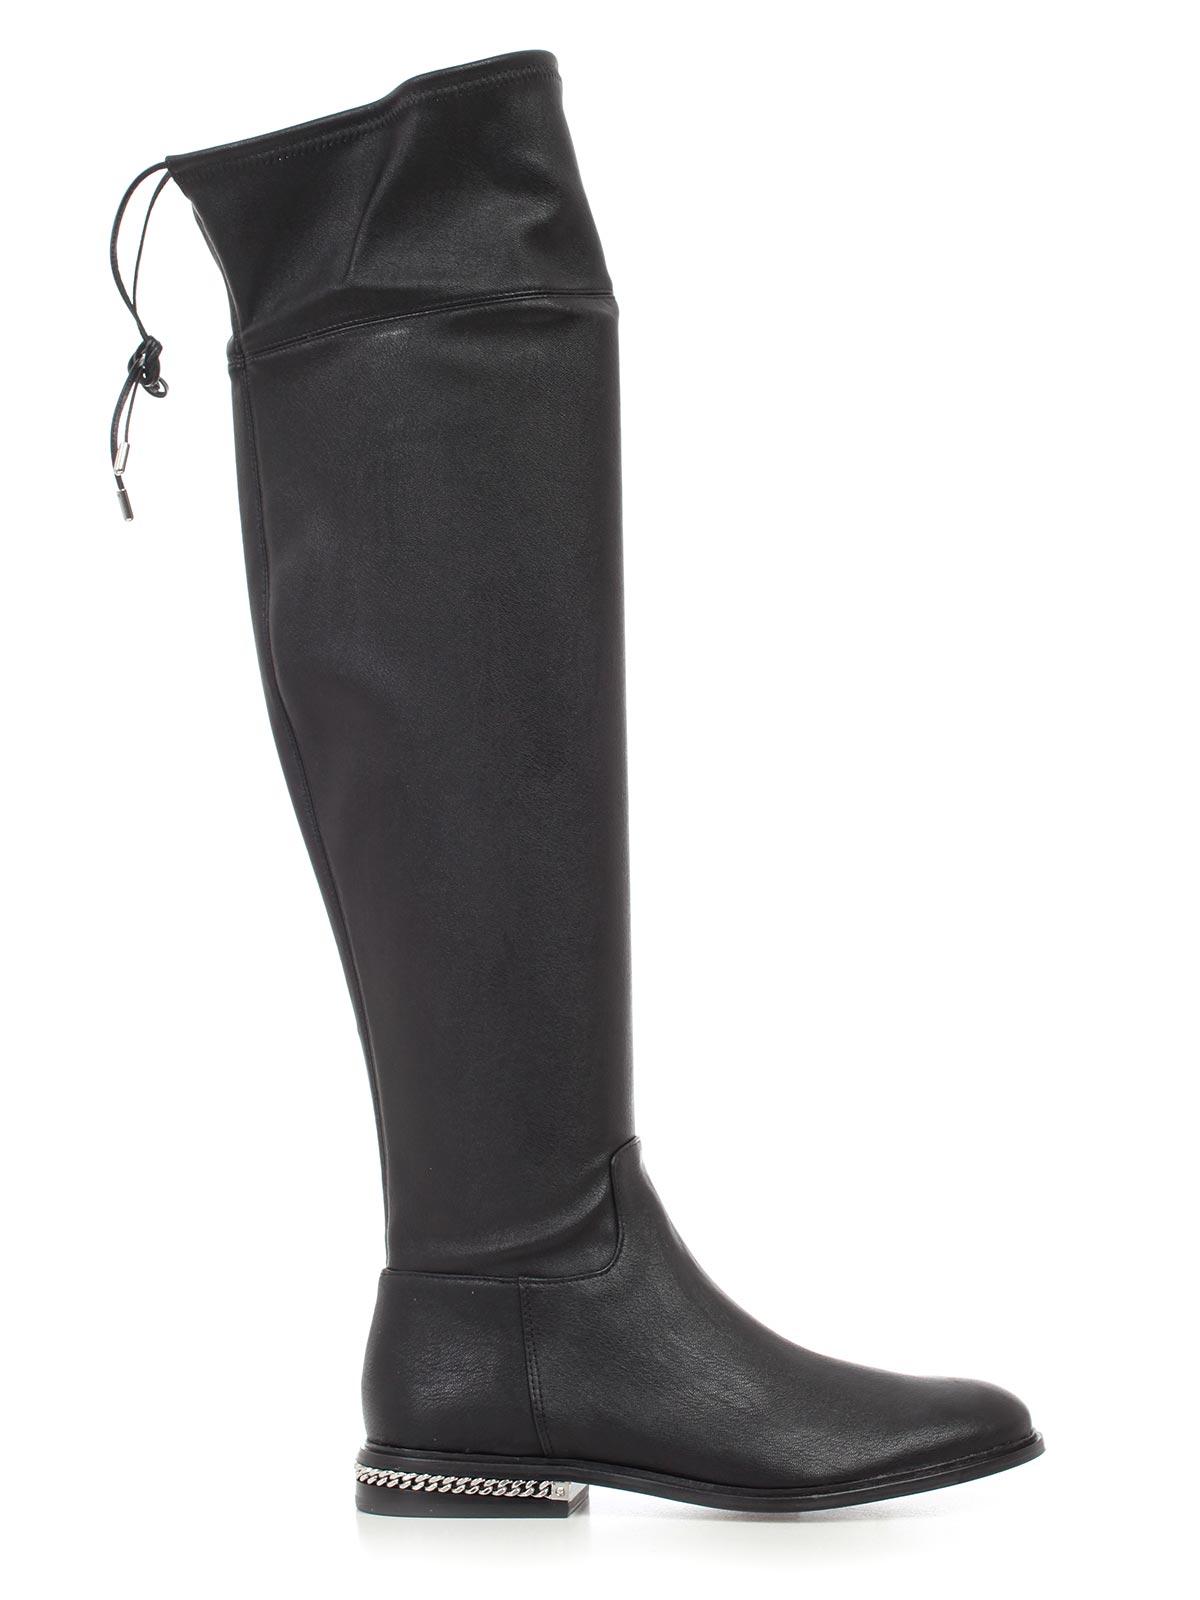 aecf40866ece Michael Michael Kors Shoes 40F8JMFB5L